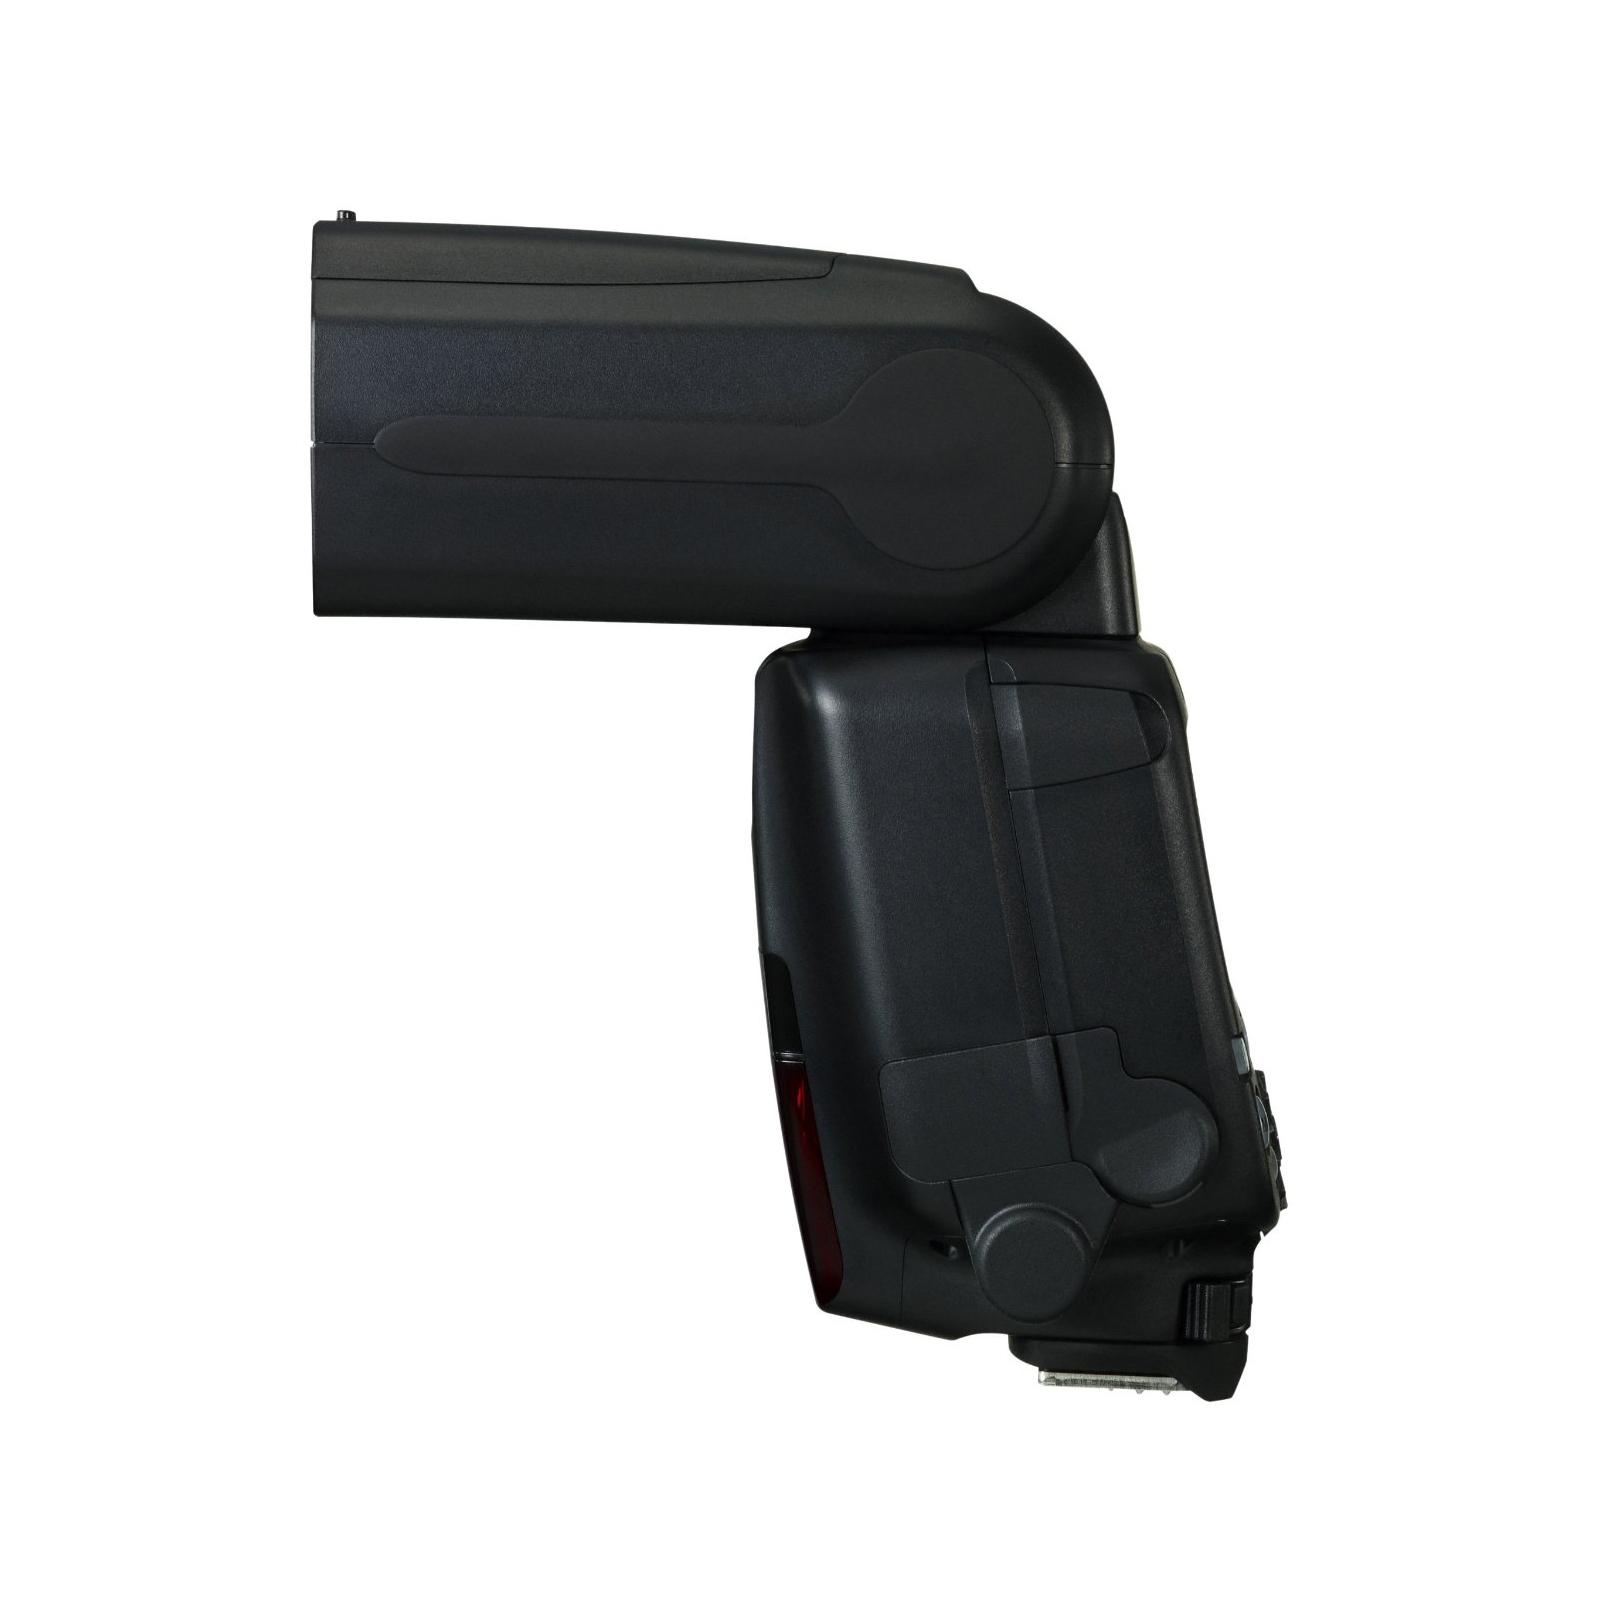 Вспышка Canon Speedlite 600EX (5739B003) изображение 6